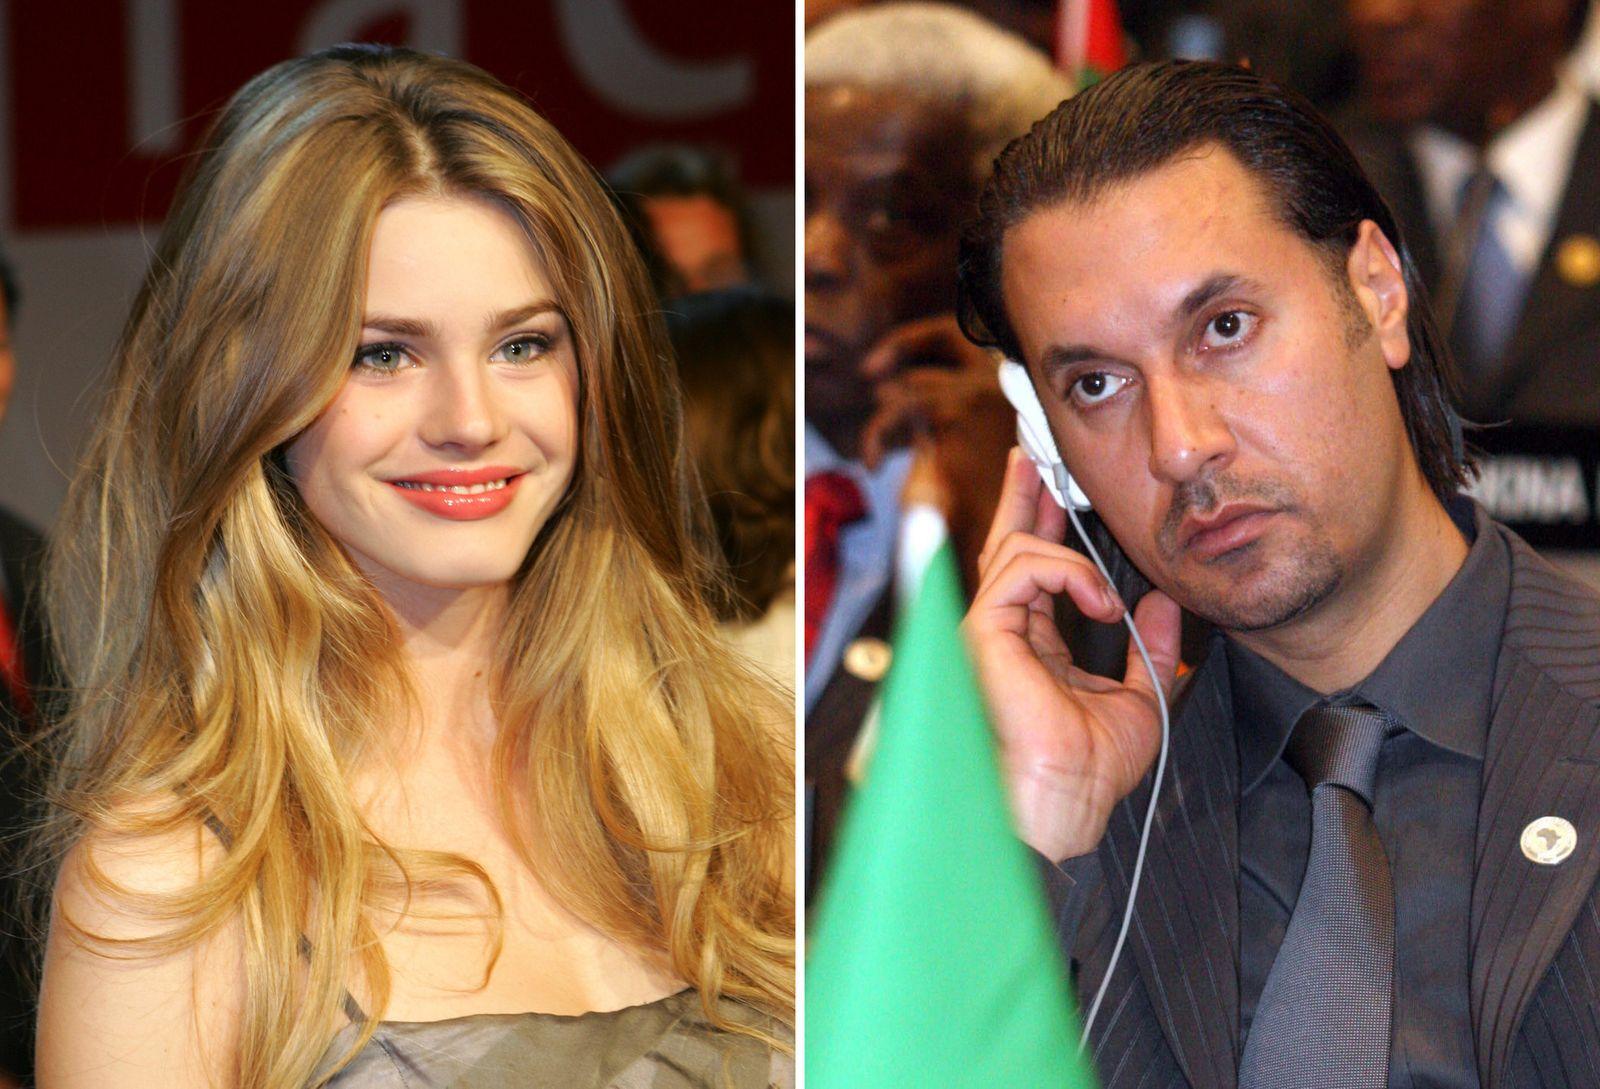 Vanessa Hessler / Mutassim Gaddafi